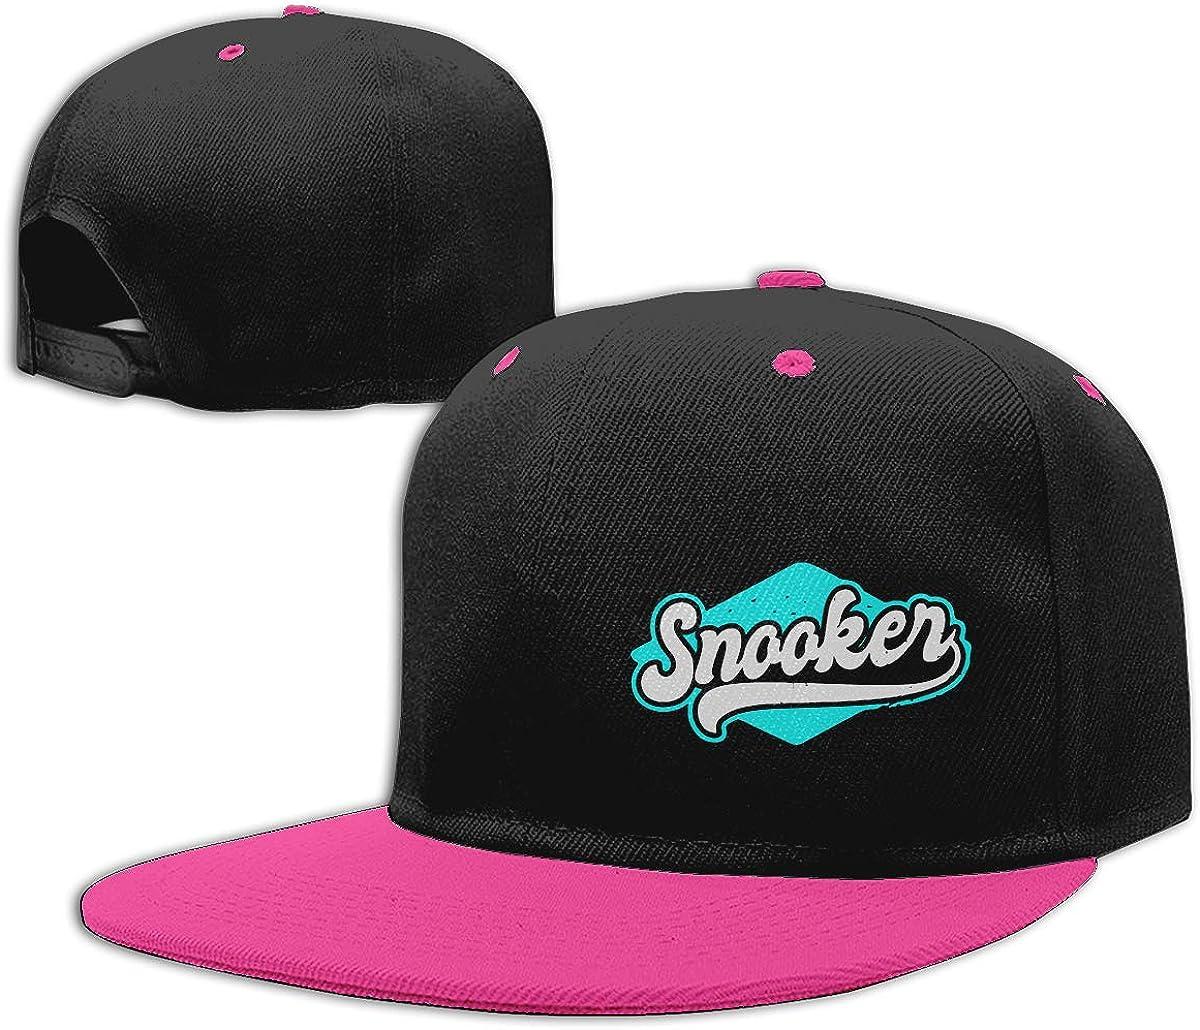 Snooker Unisex Flat Brim Baseball Caps Women Men Punk Rock Cap